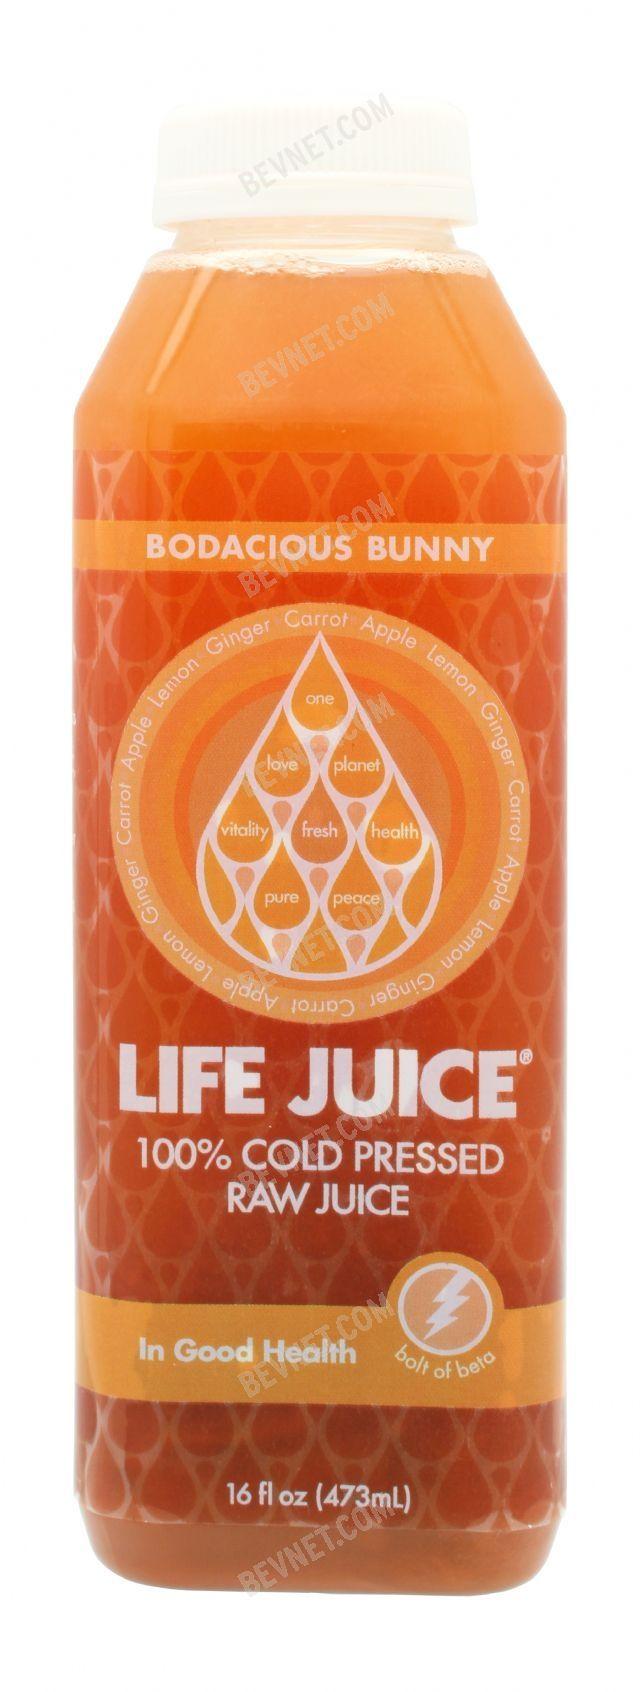 Life Juice: